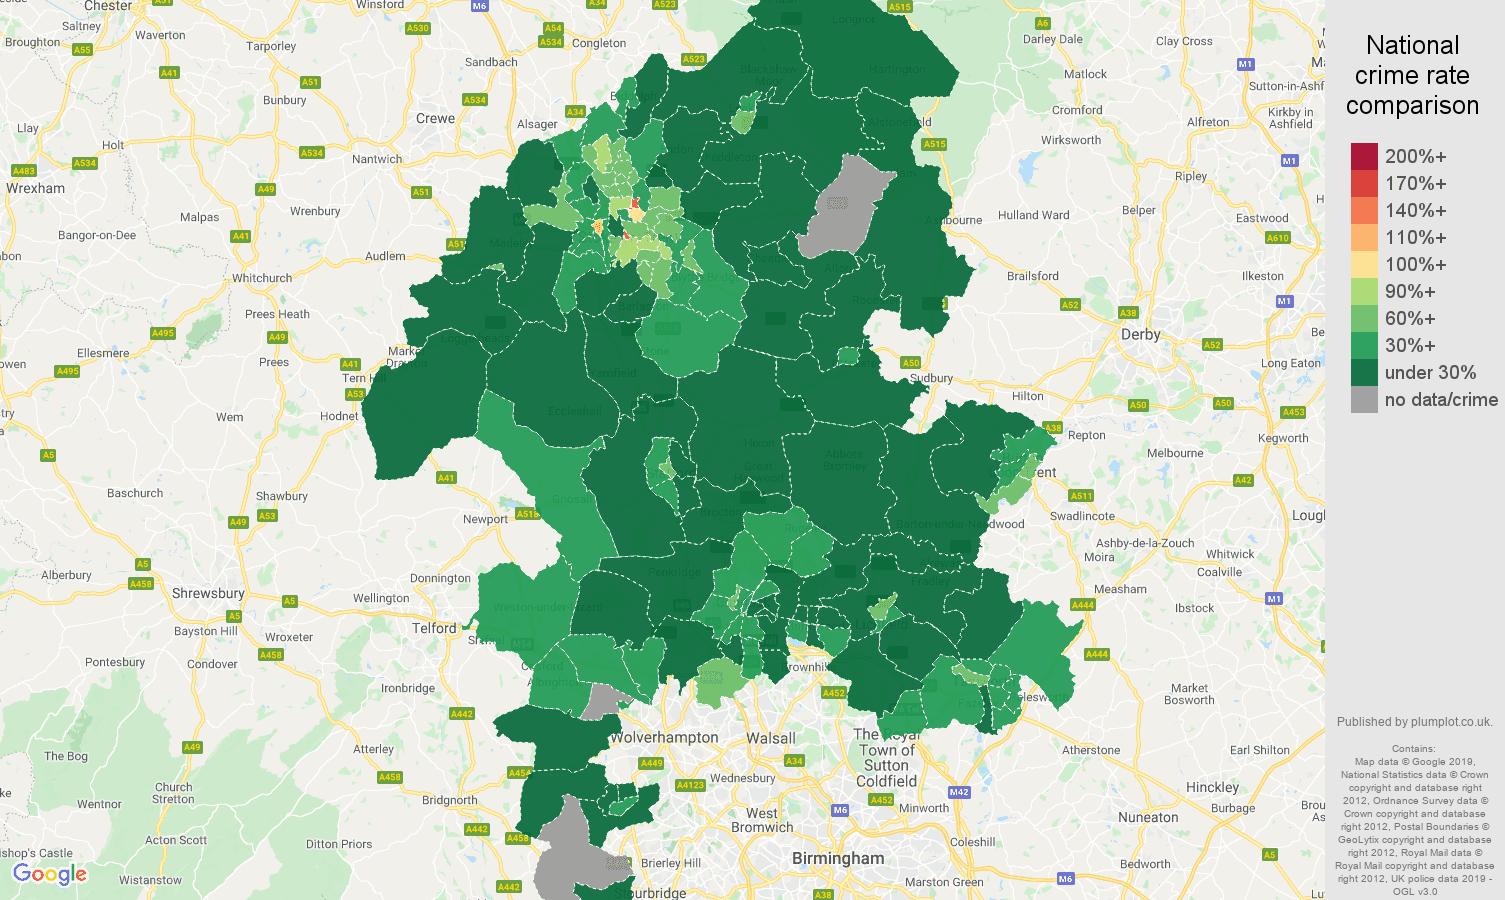 Staffordshire public order crime rate comparison map